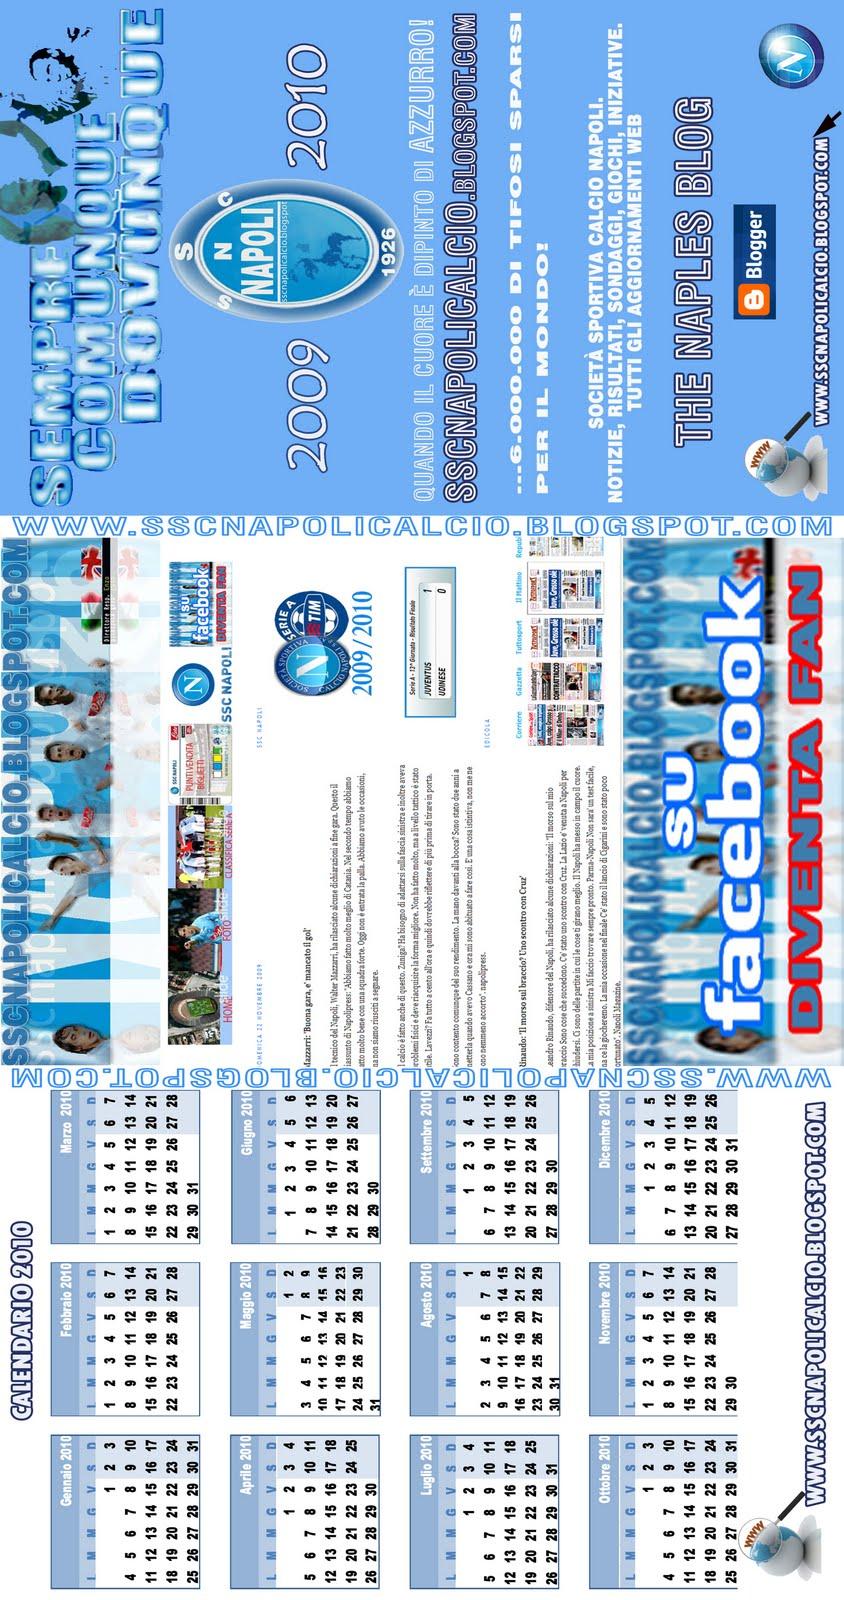 Mtv Info Blog Com: Calendario Sara Tommasi 2009 Jun 23 ...